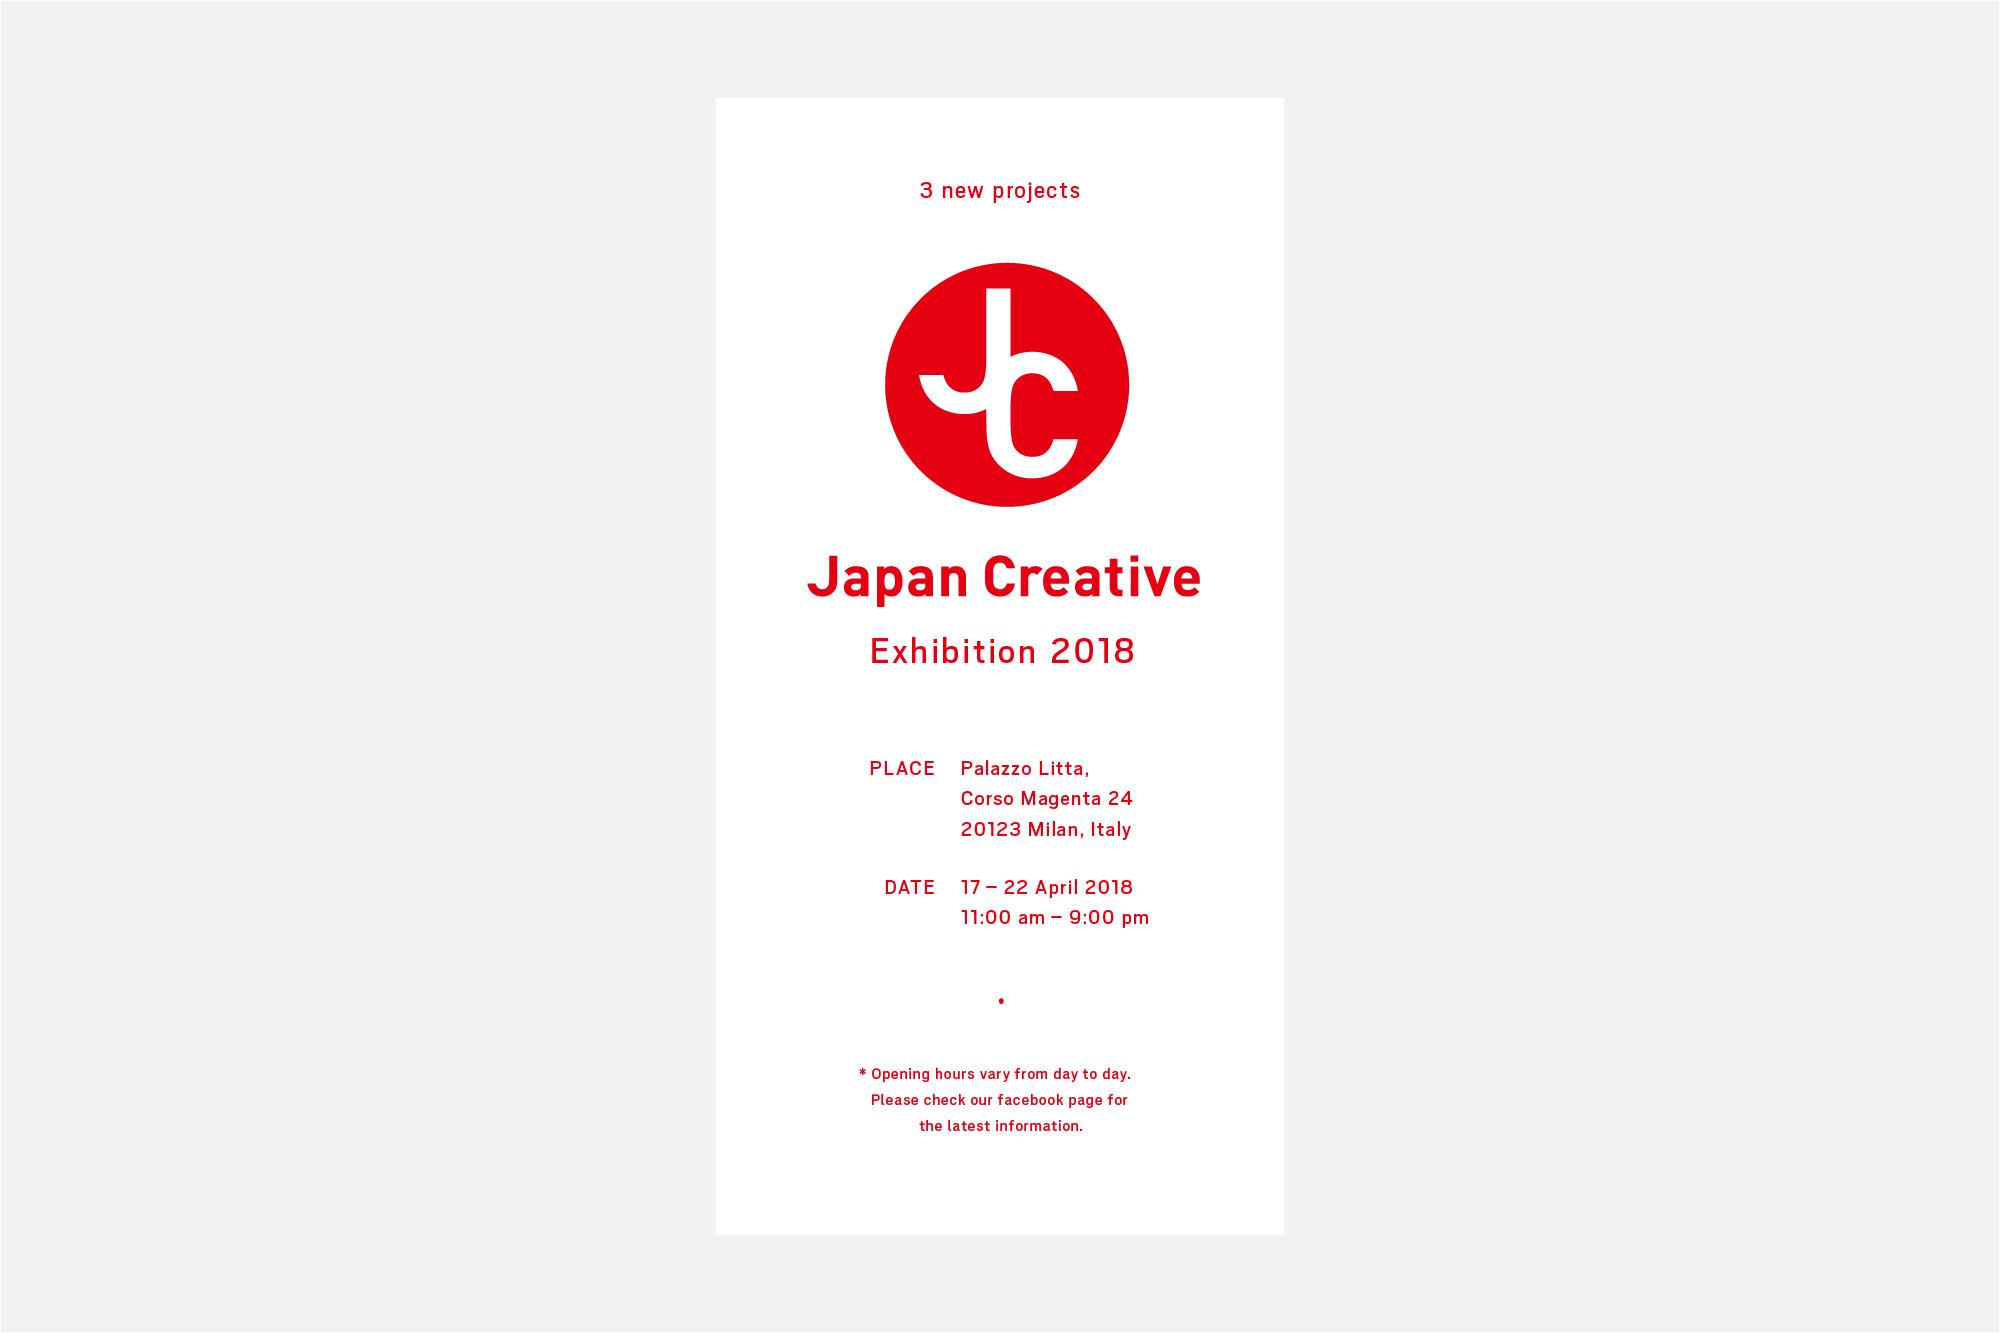 Japan Creative Exhibition Milan 2018